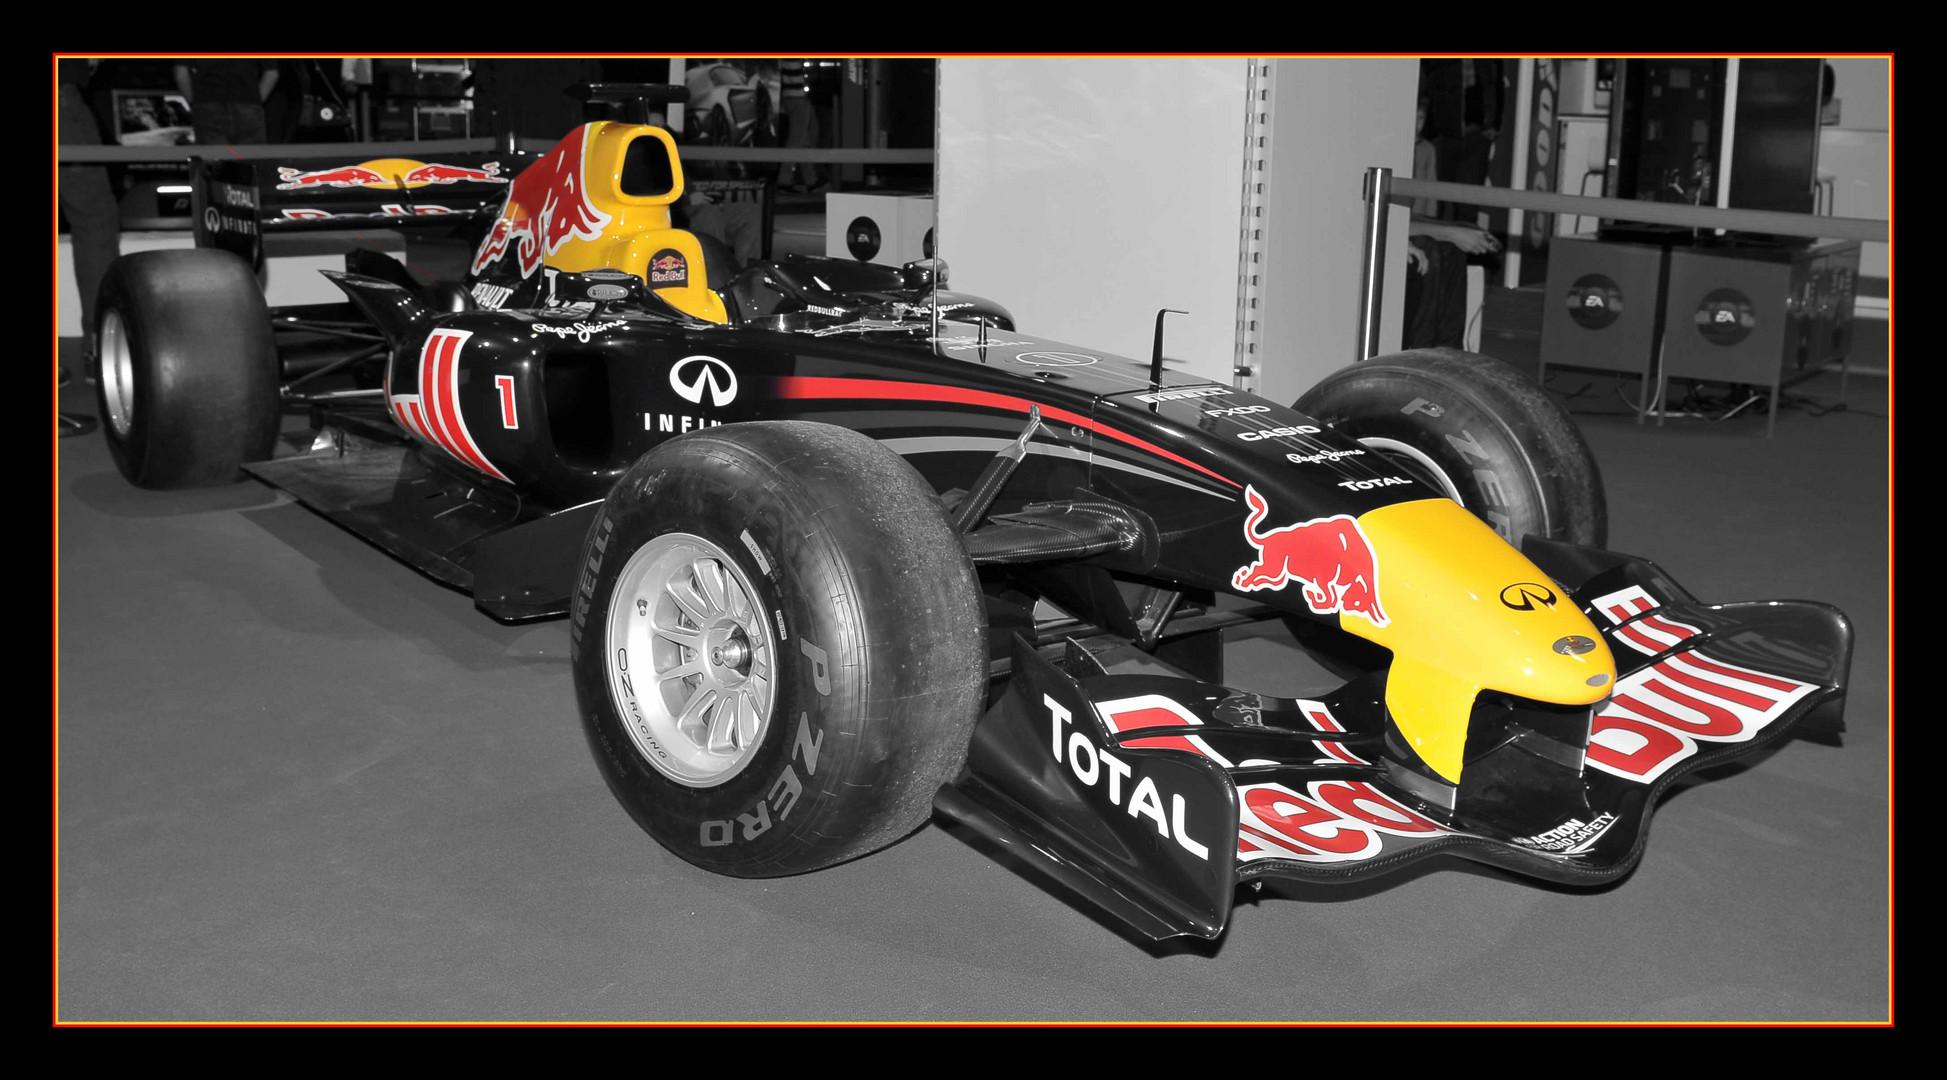 Colorkey des Red Bull von S. Vettel